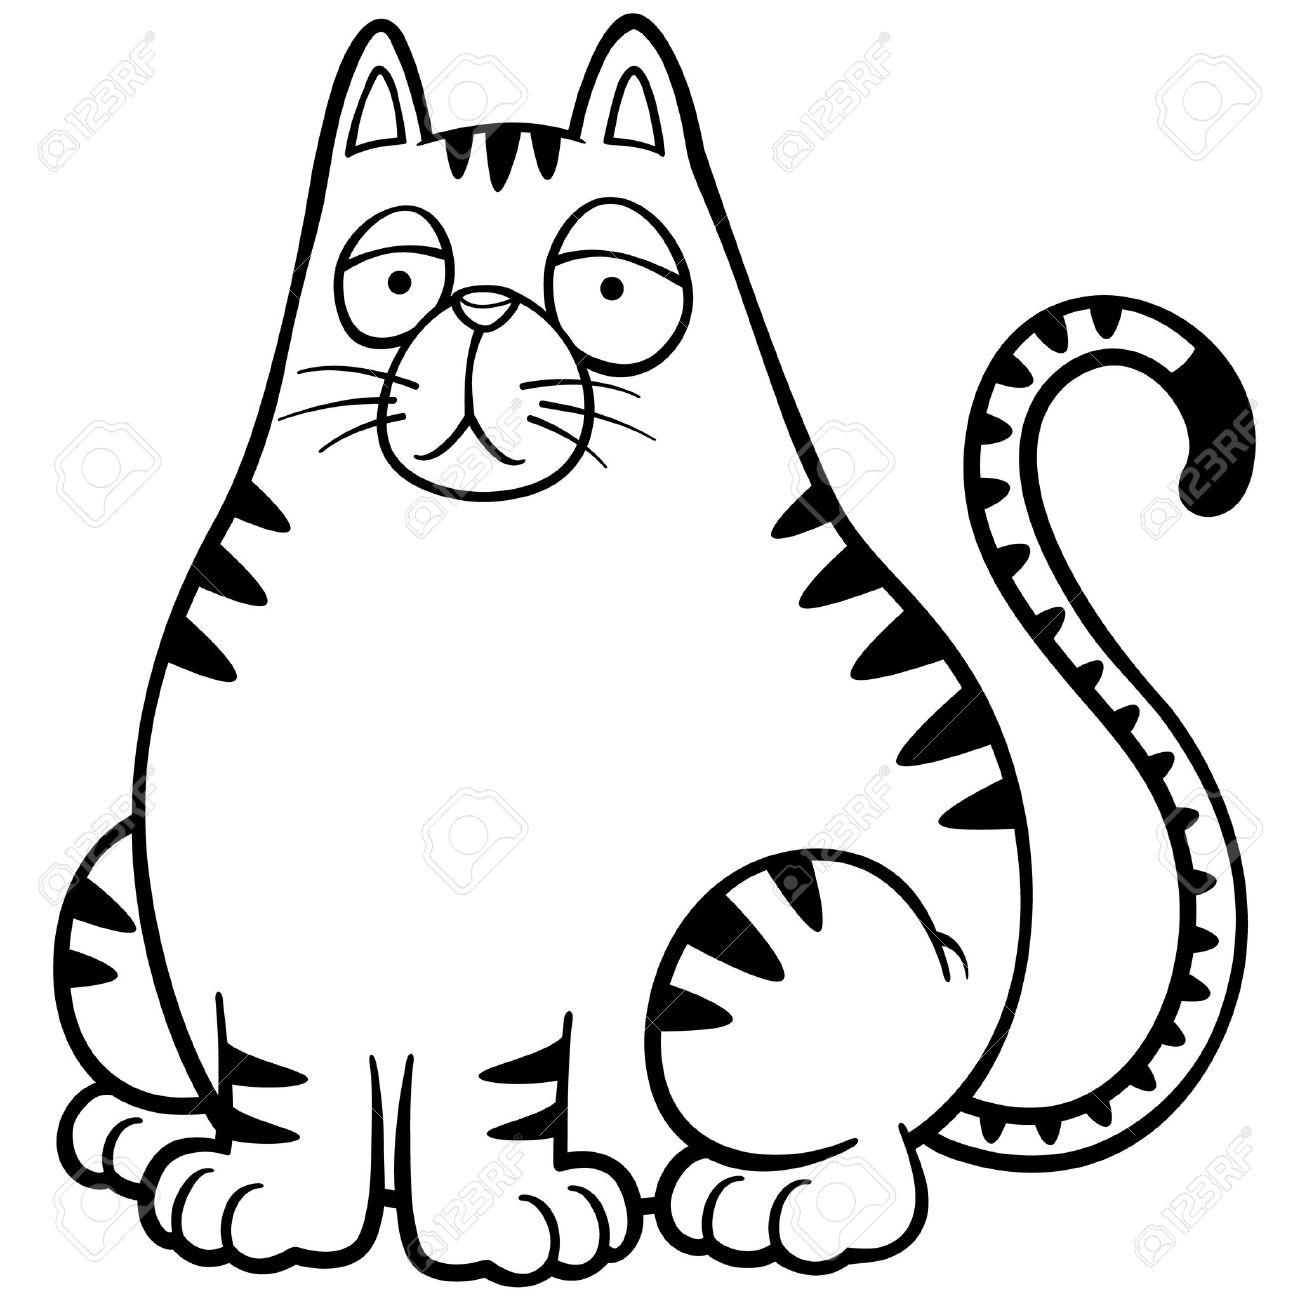 vector illustration of cat cartoon coloring book stock vector 27322020 - Cat Coloring Book